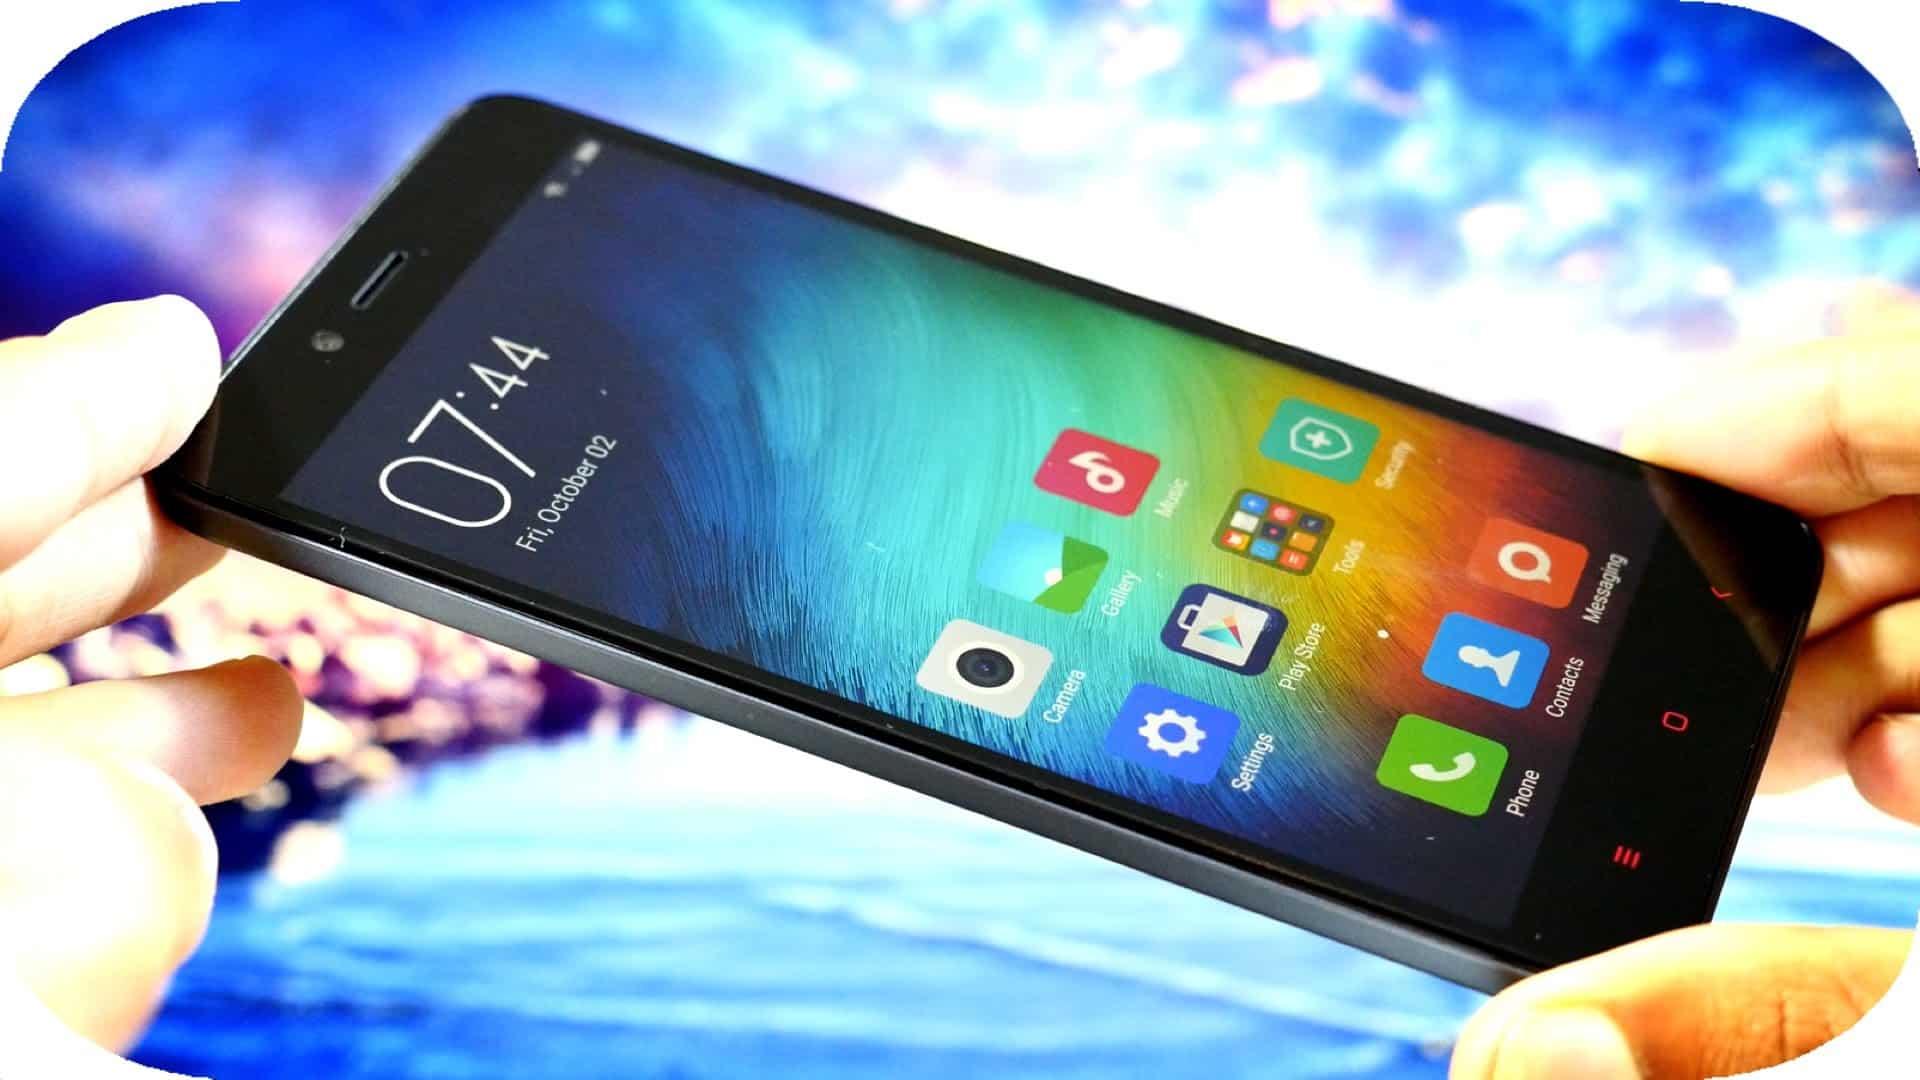 Xiaomi Redmi 3s Plus VS BLU Life One X2